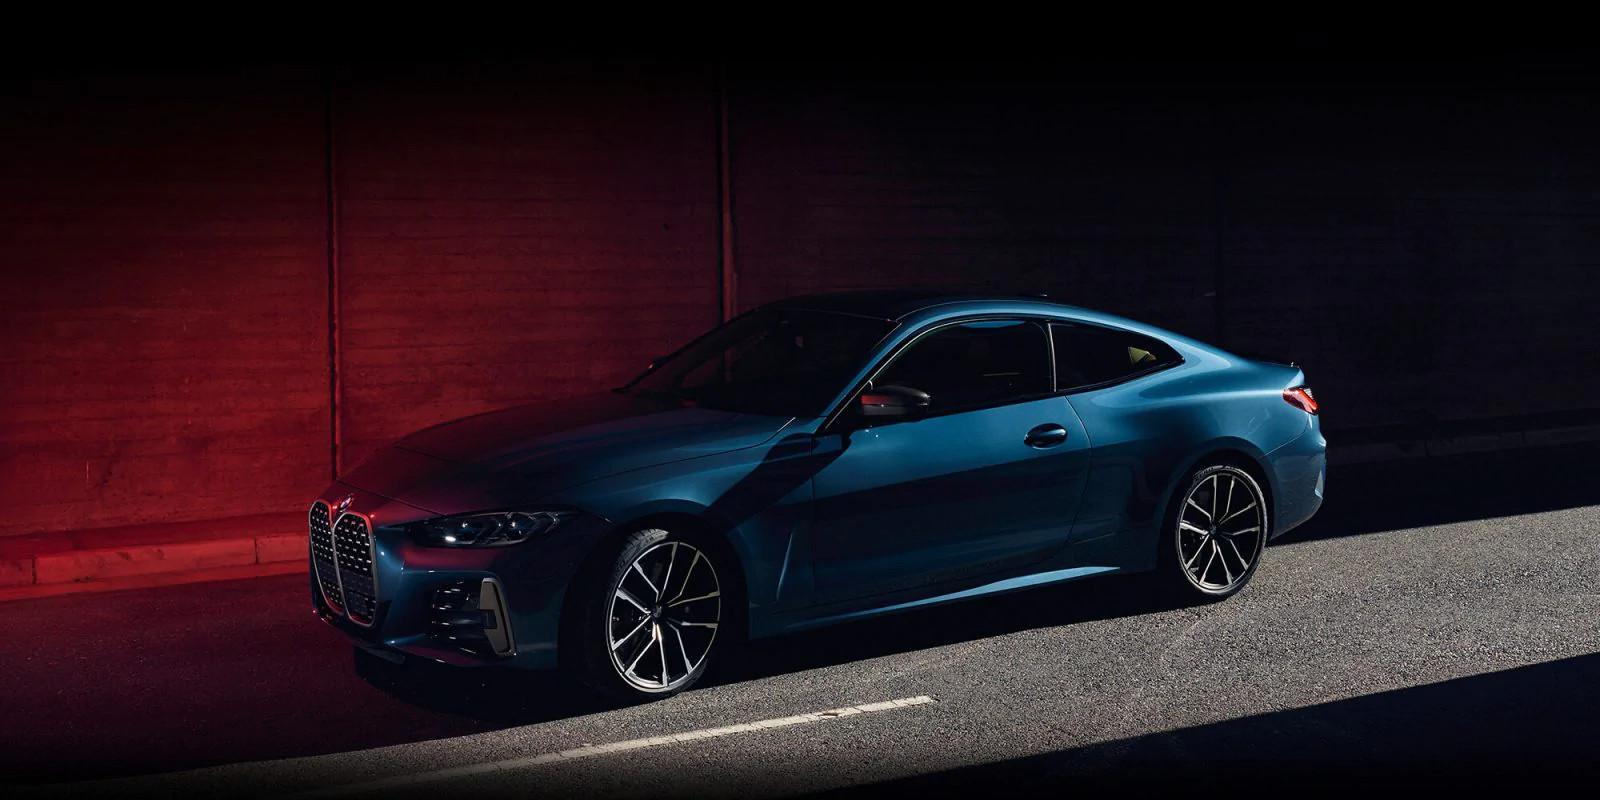 BMW Seria 4 Coupe fara numarul de inmatriculare pe fata - BMW Seria 4 Coupe fara numarul de inmatriculare pe fata